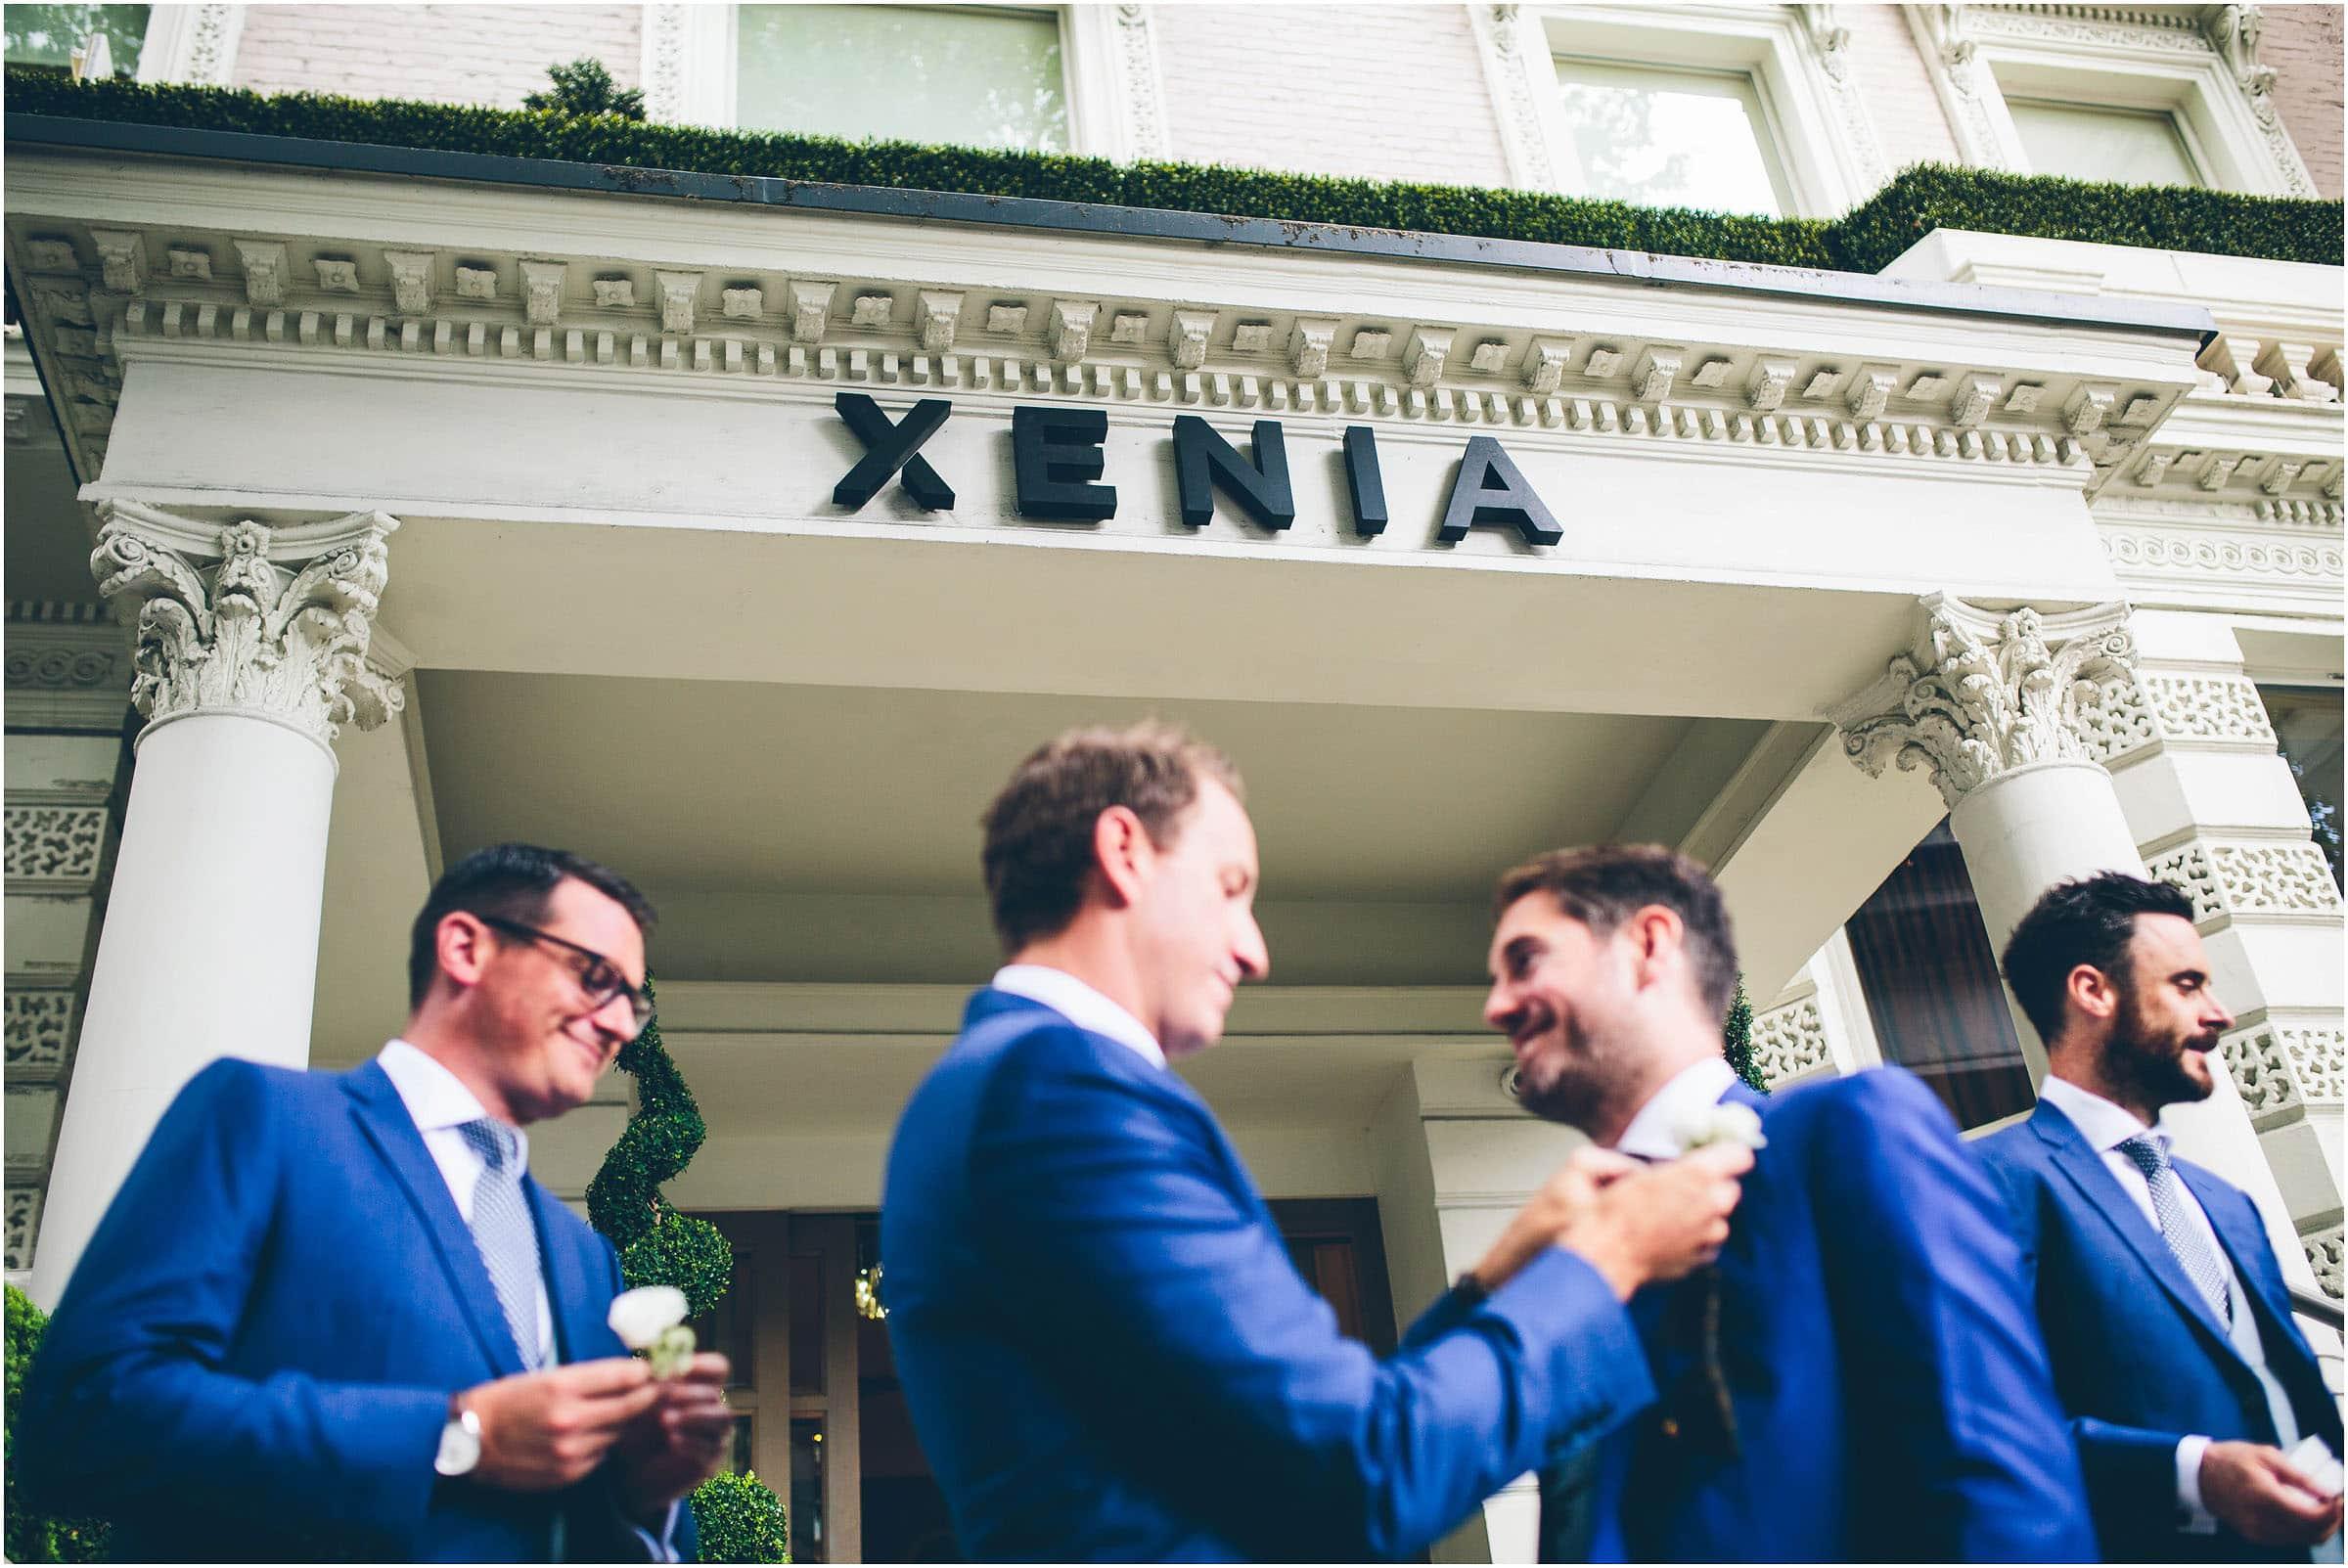 Kensington_Roof_Gardens_Wedding_Photography_0002